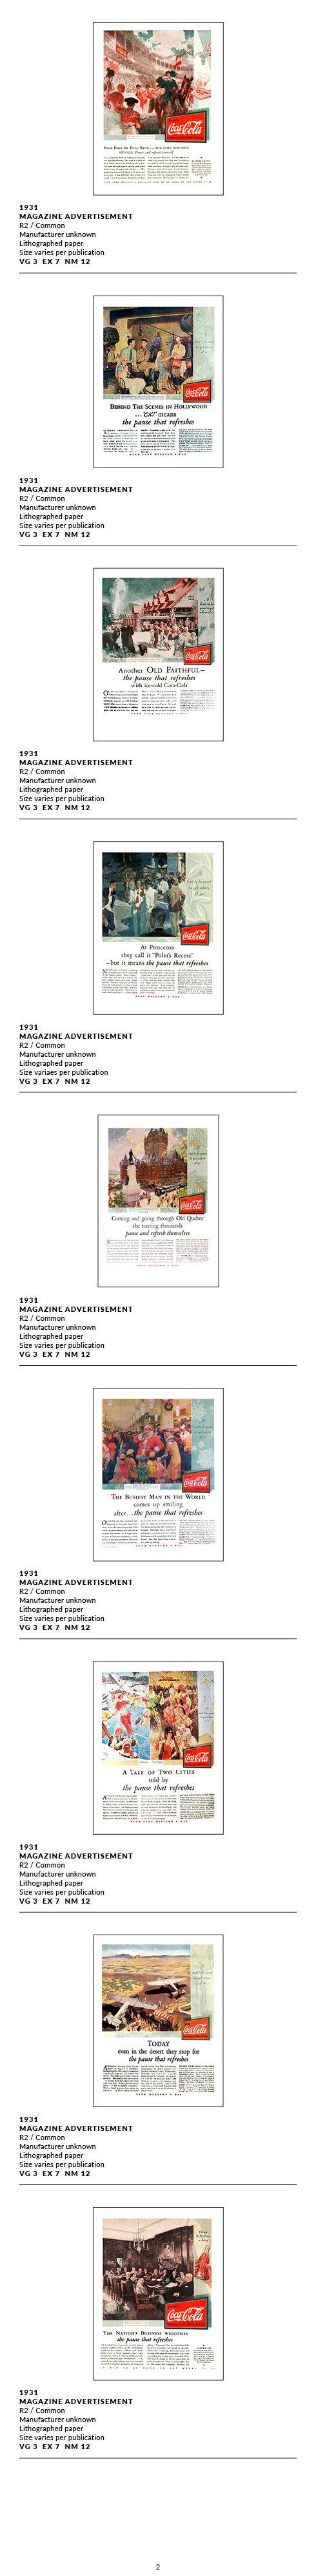 1930-34 Ads2.jpg